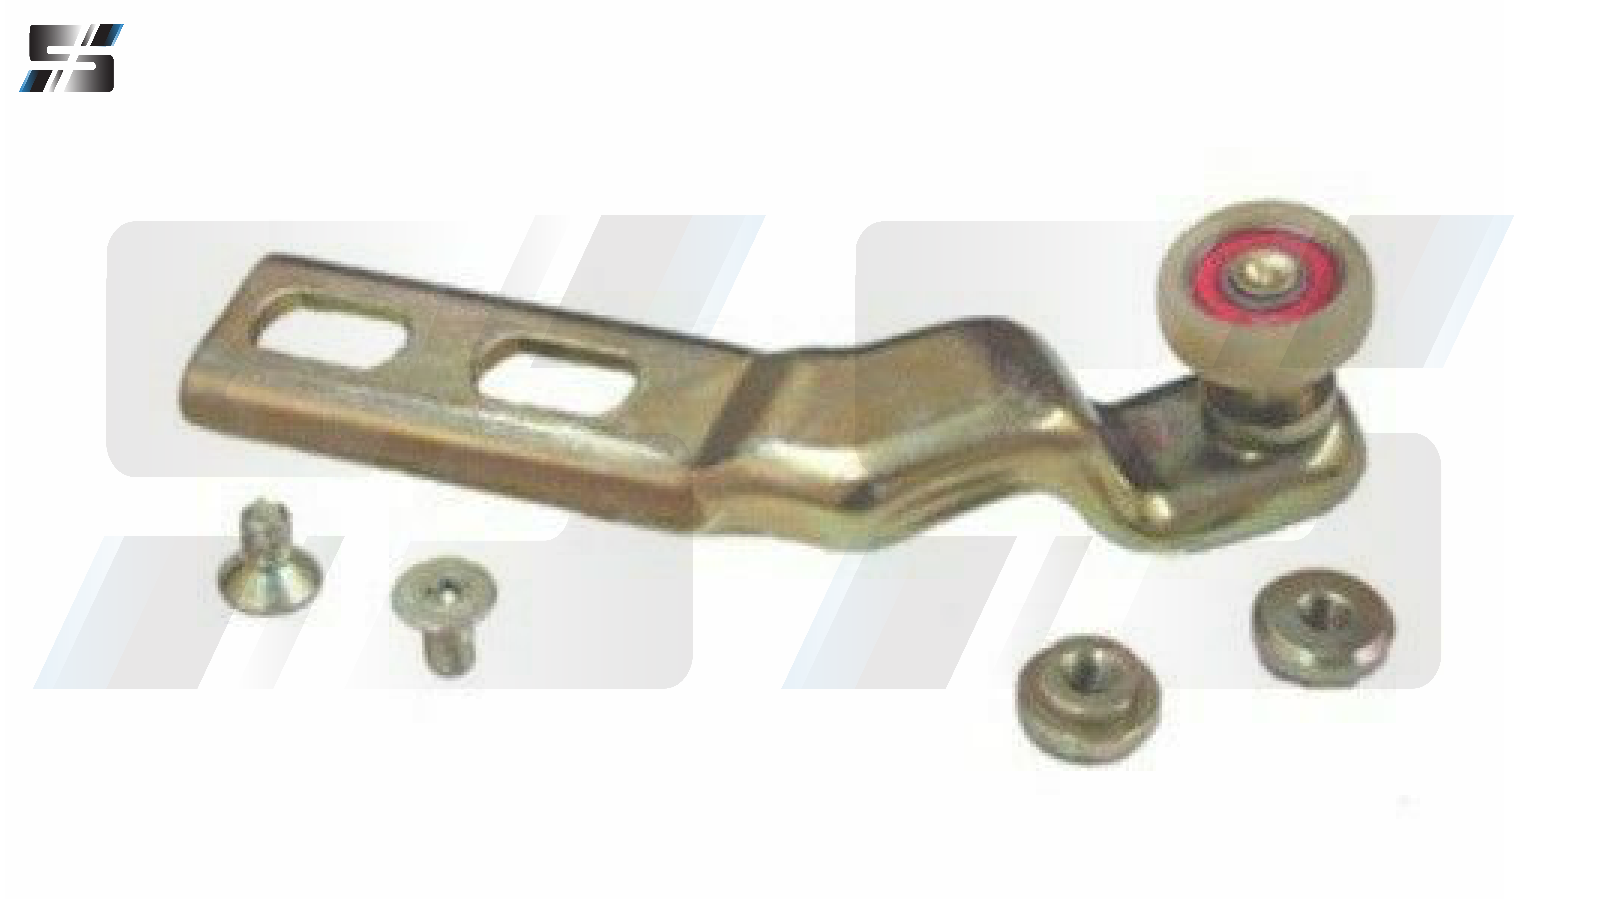 JSD 9017600128 Sliding Door Roller fits Mercedes-Benz Dodge Sprinter 2500 3500 Lower Right